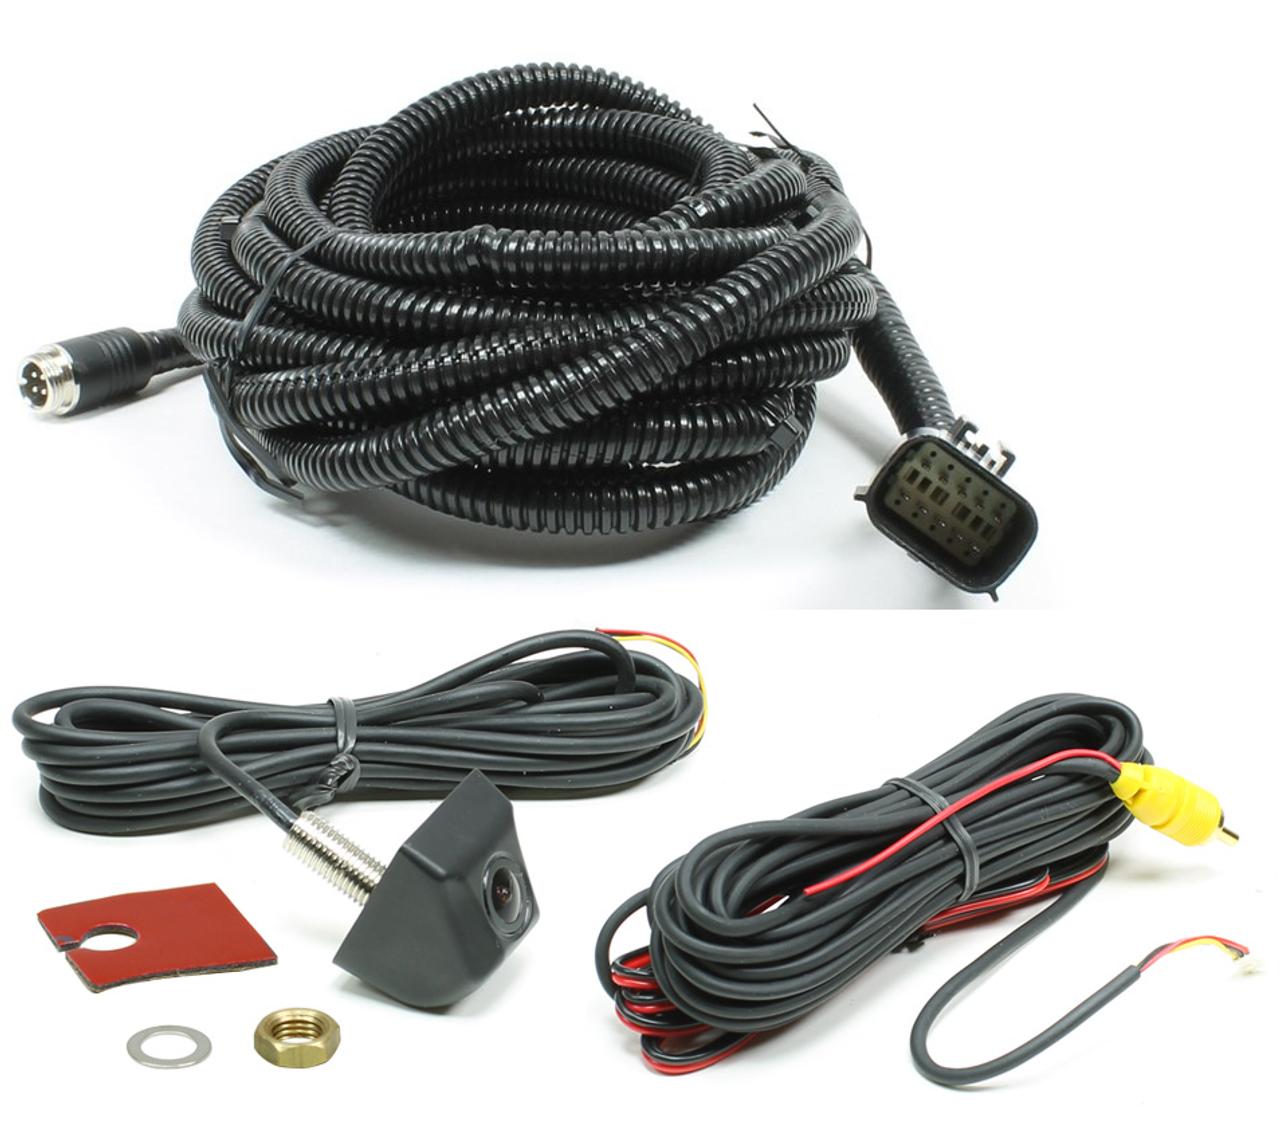 250-8674-W 2019 Ranger Tailgate Replace Kit Auto Lowering Tailgate